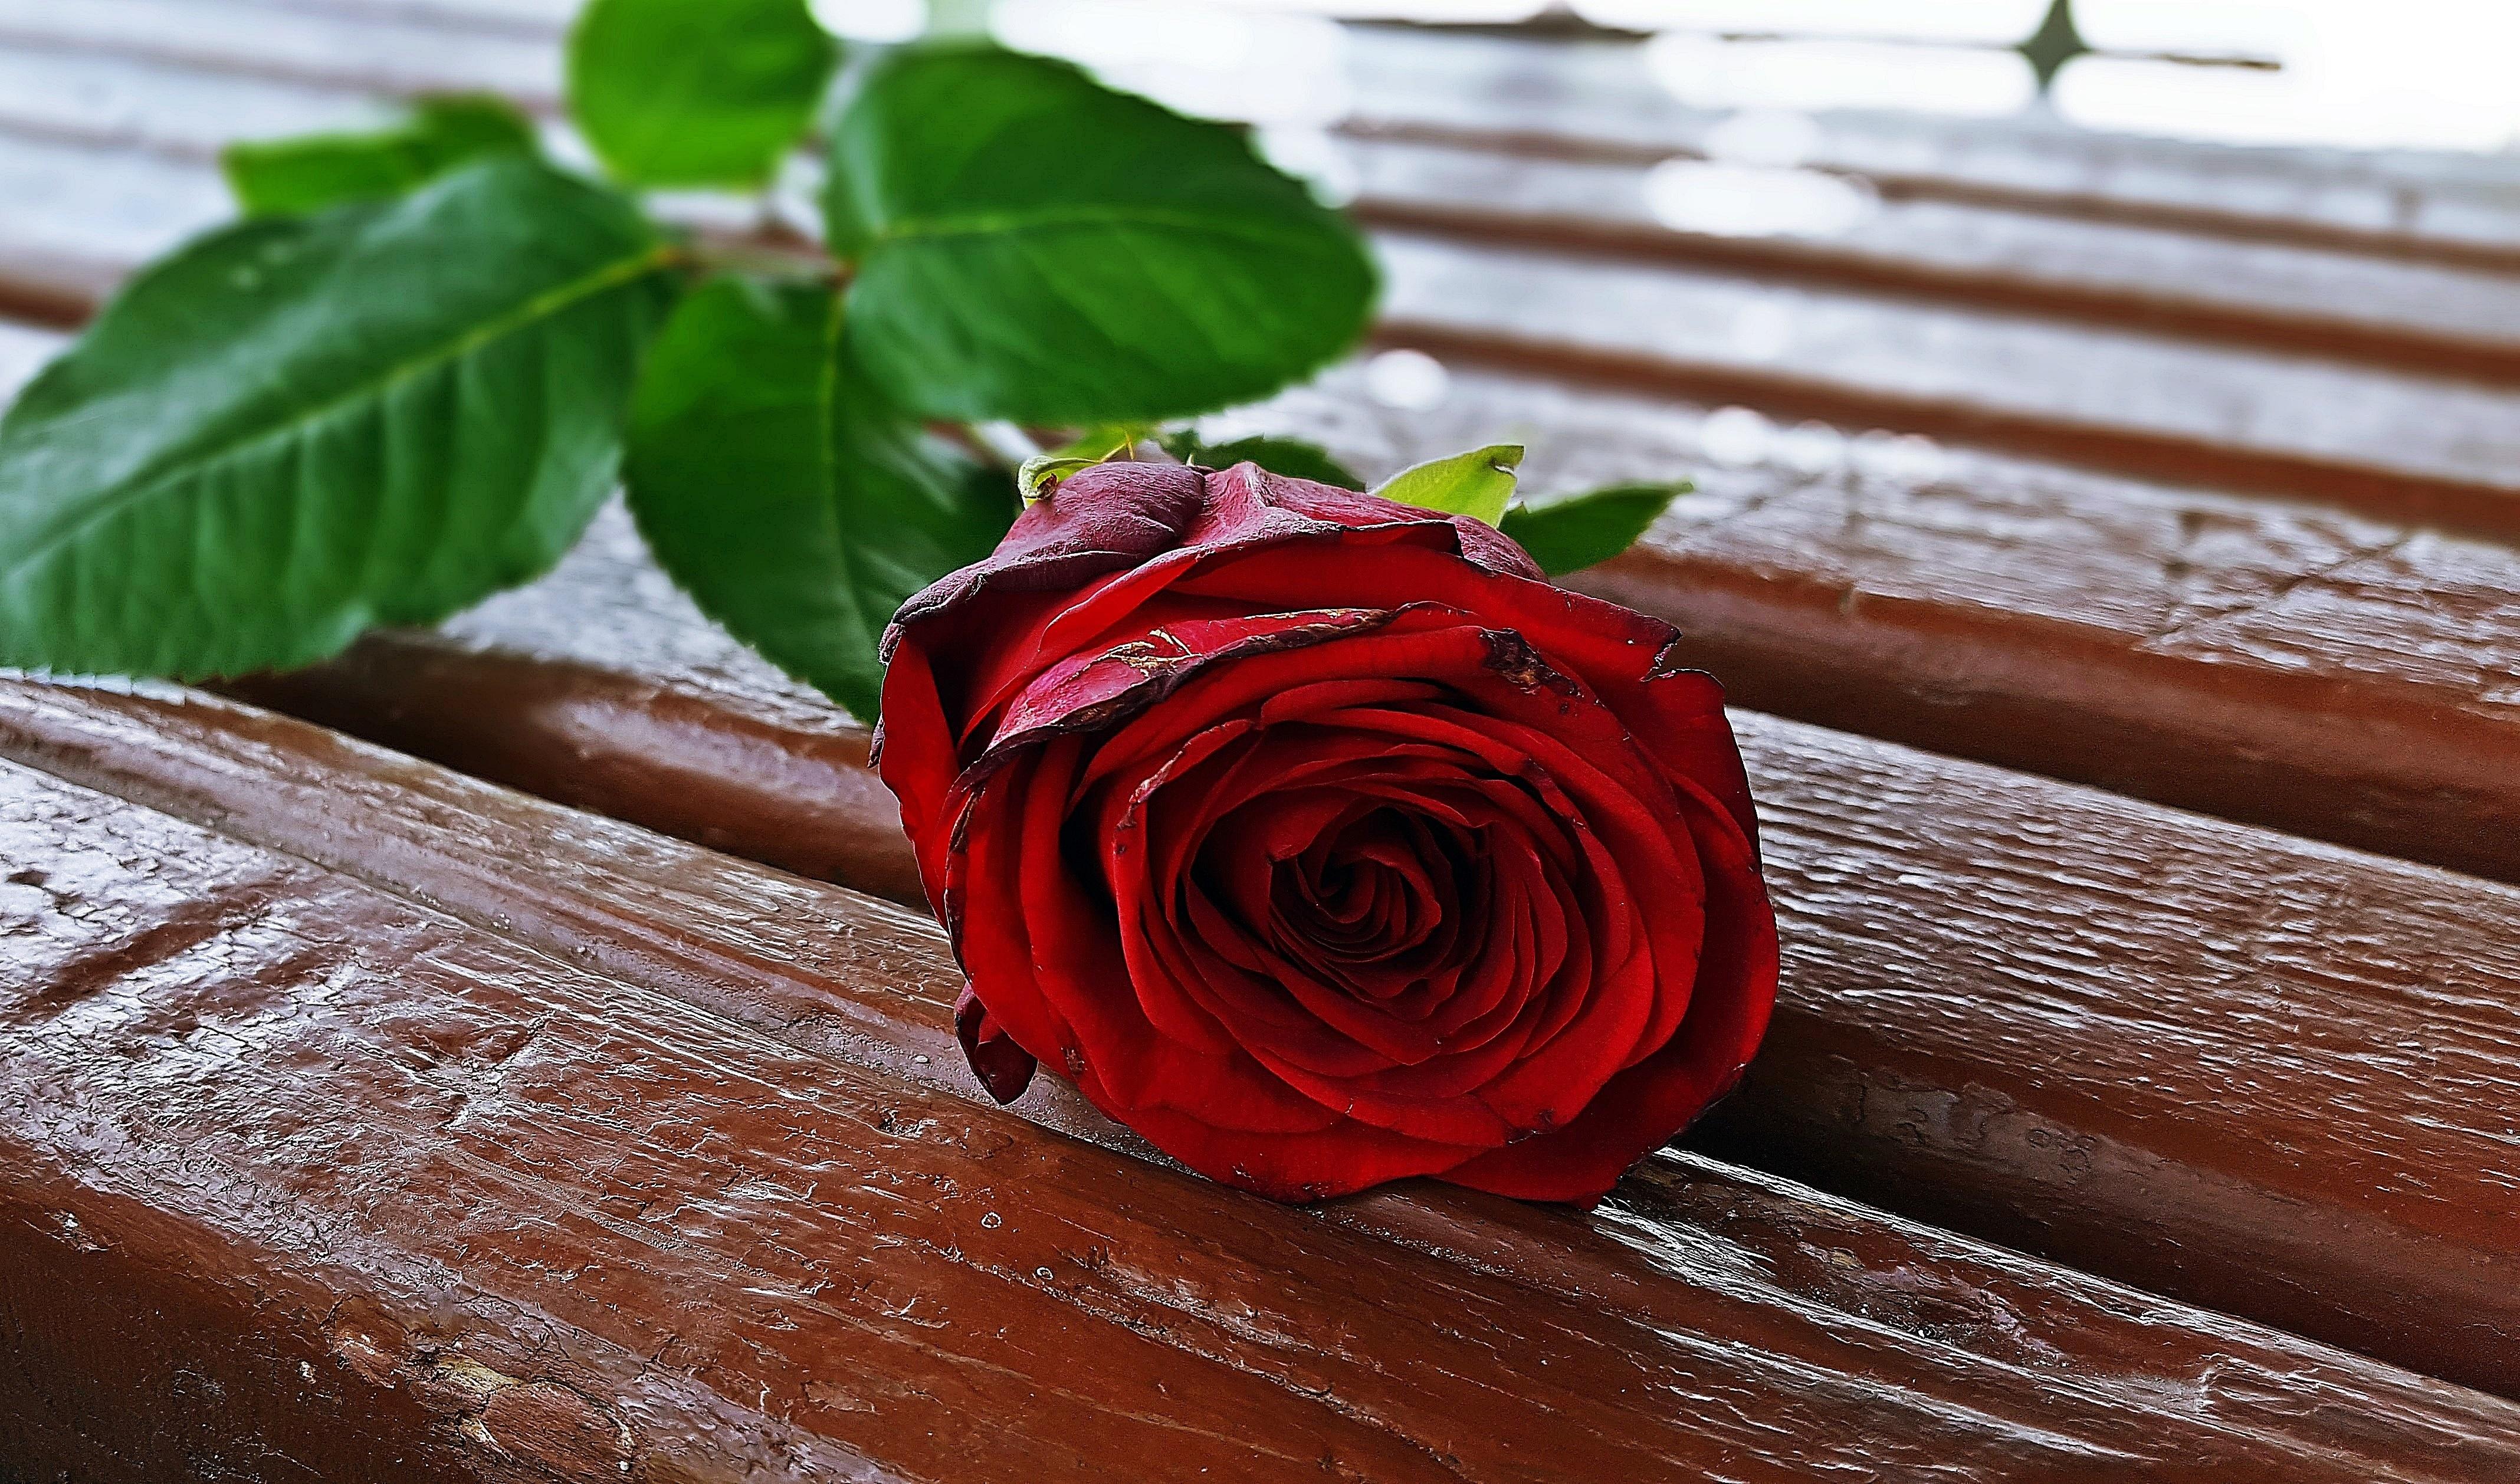 Free Images Woman Leaf Petal Floral Love Gift Romance